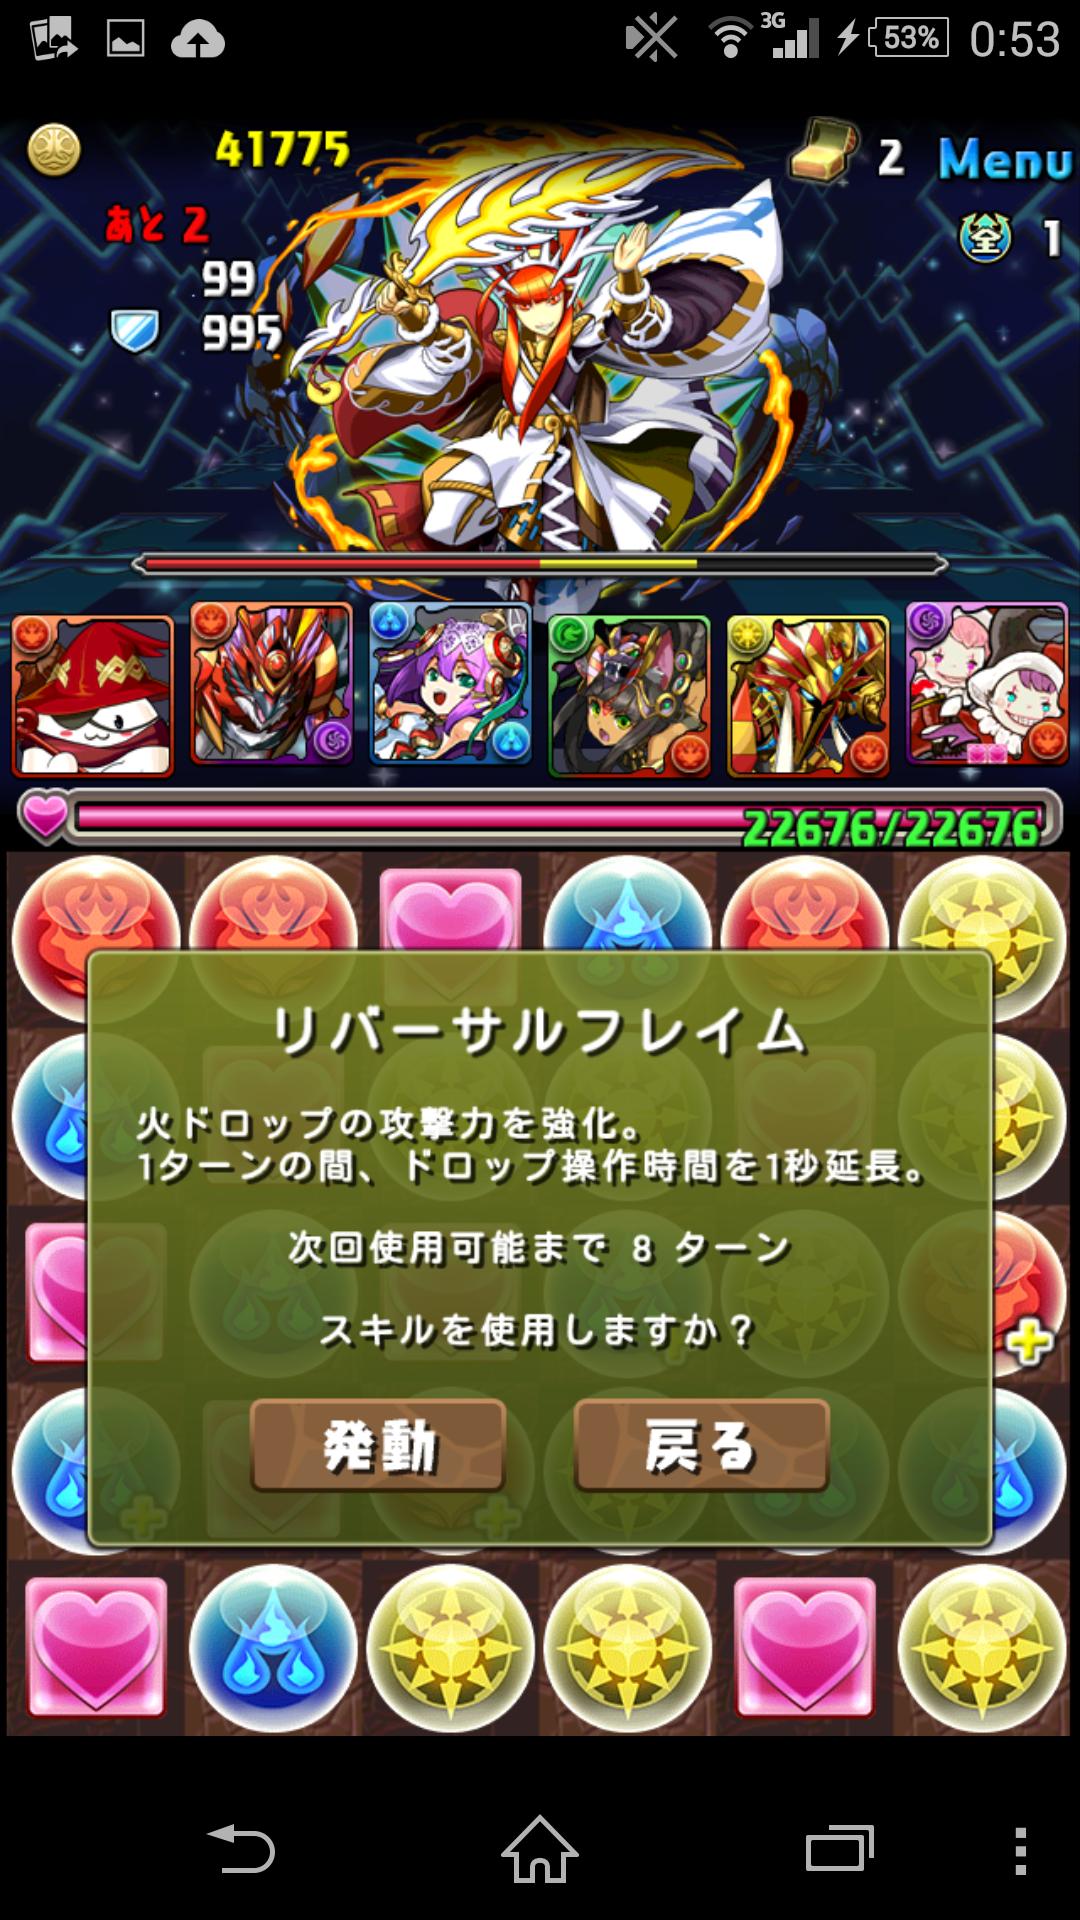 Screenshot_2015-04-10-00-53-15.png